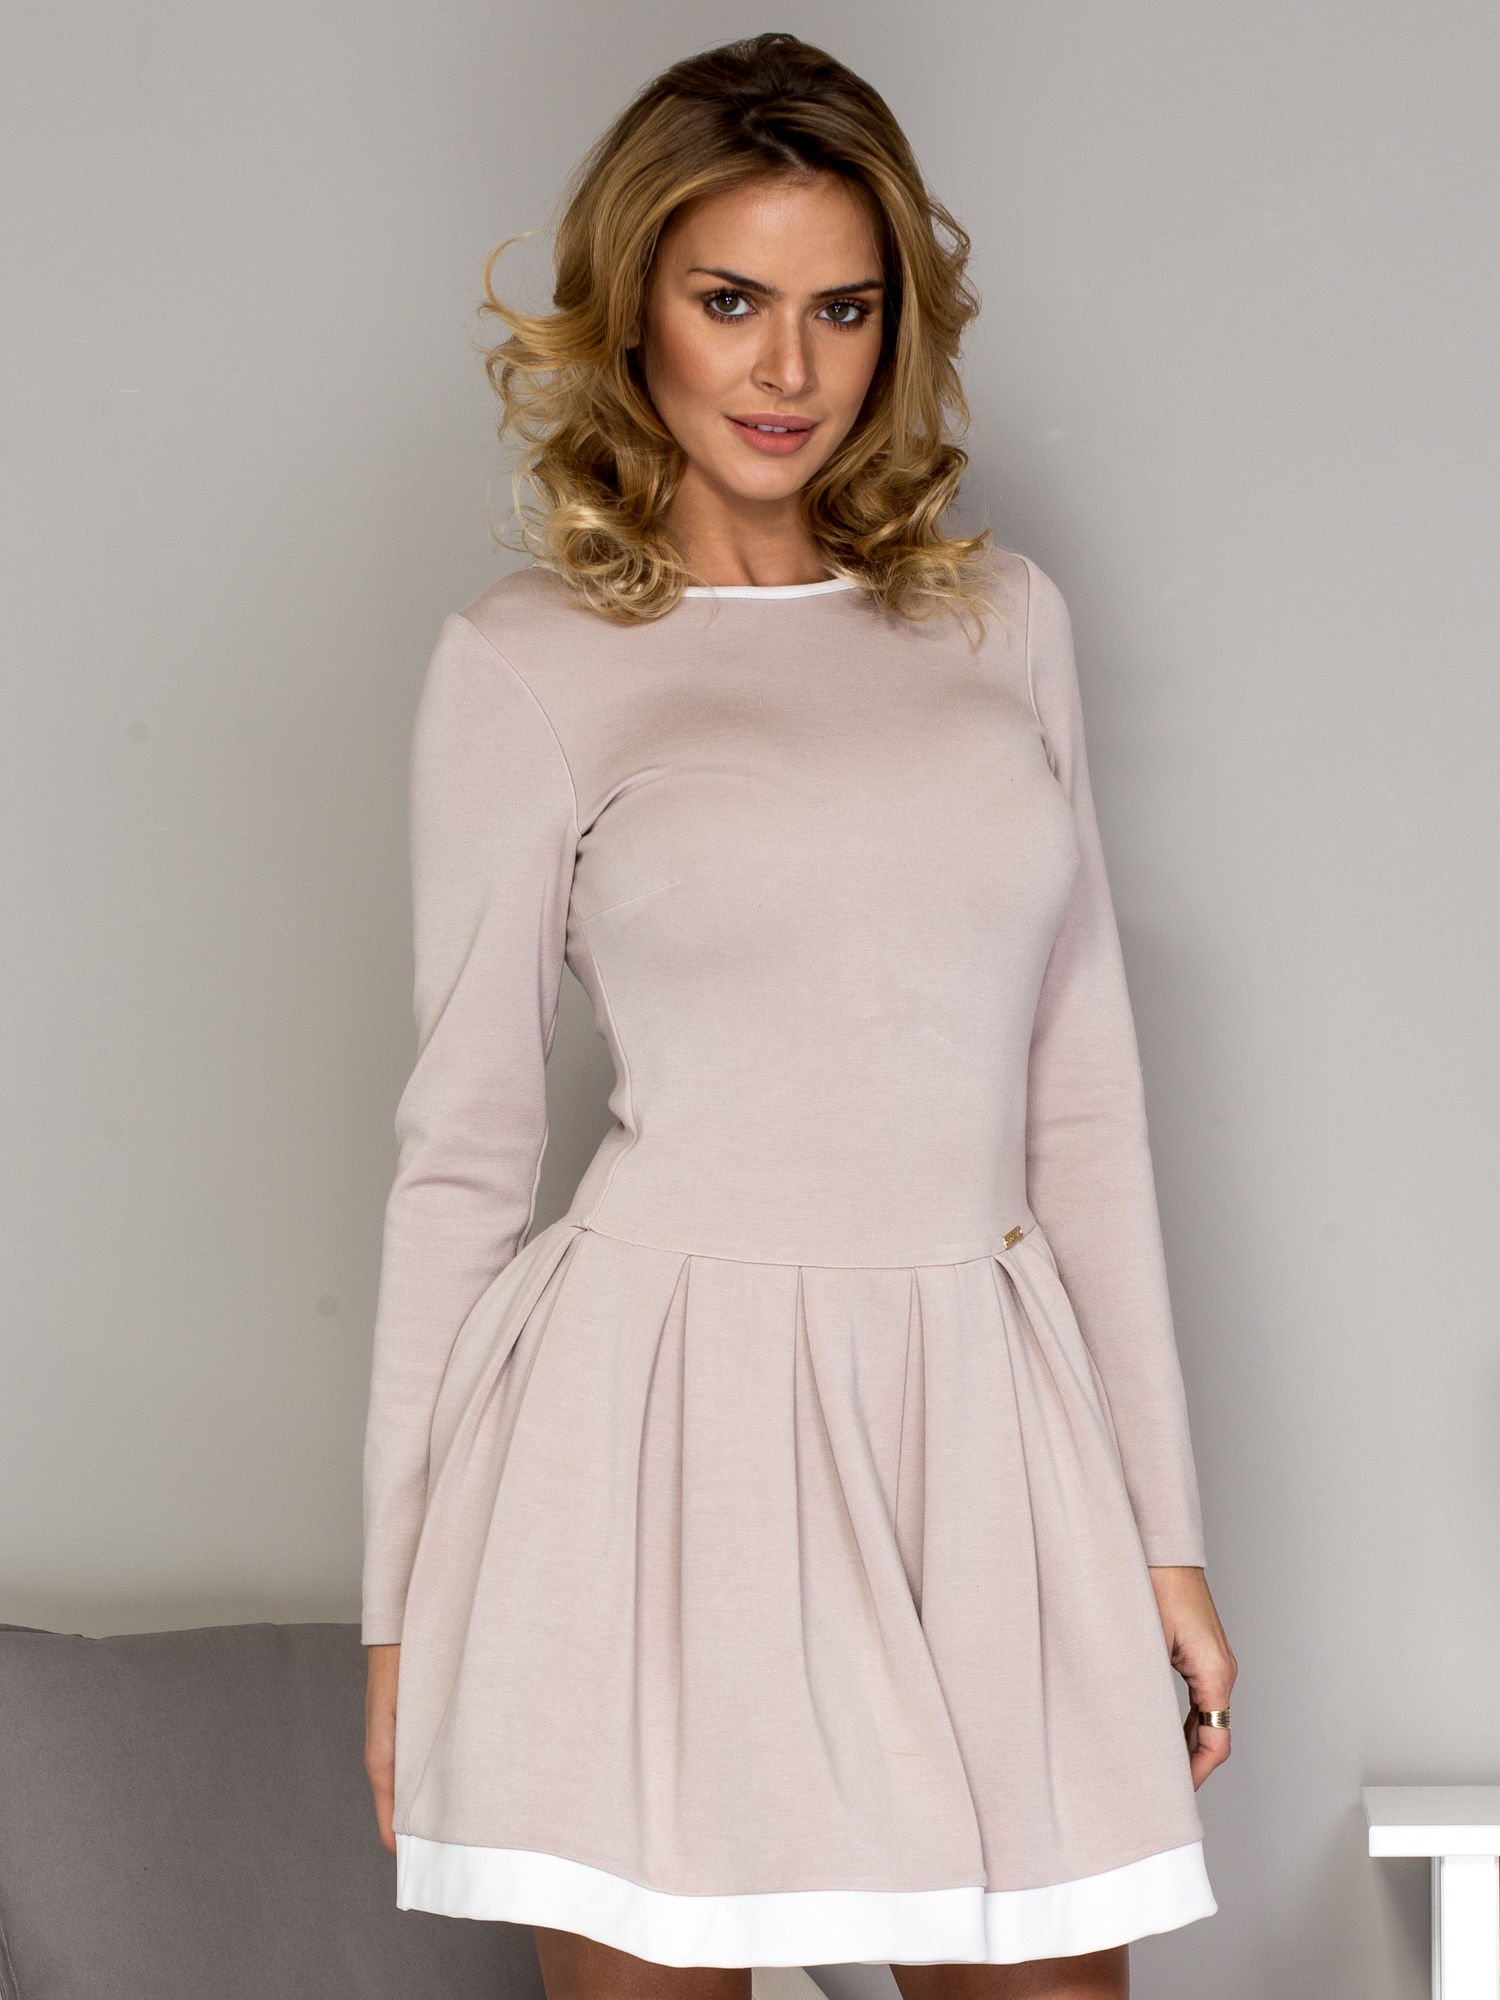 368eddb15d Rozkloszowana sukienka damska beżowa - Sukienka koktajlowa - sklep eButik.pl